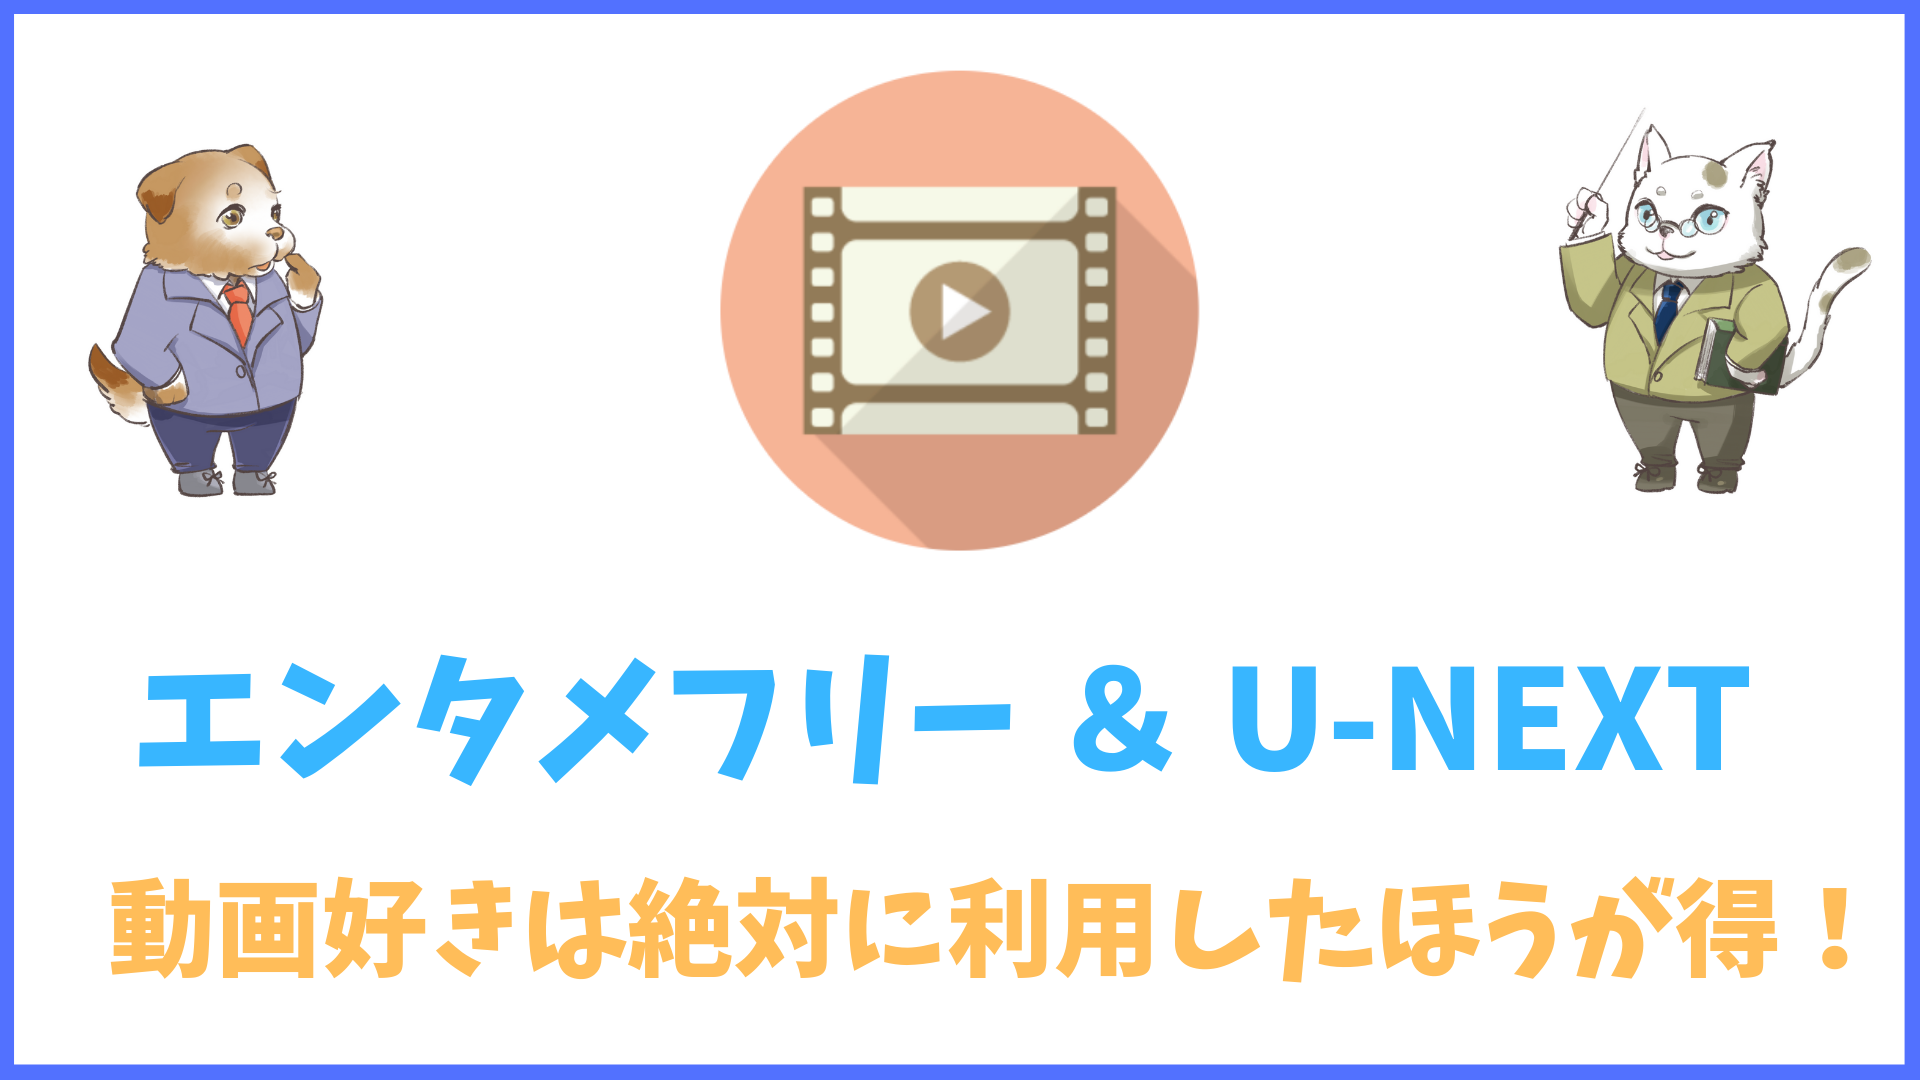 【BIGLOBE】エンタメフリーオプション対象のU-NEXTは実際どう?動画好きは必見!